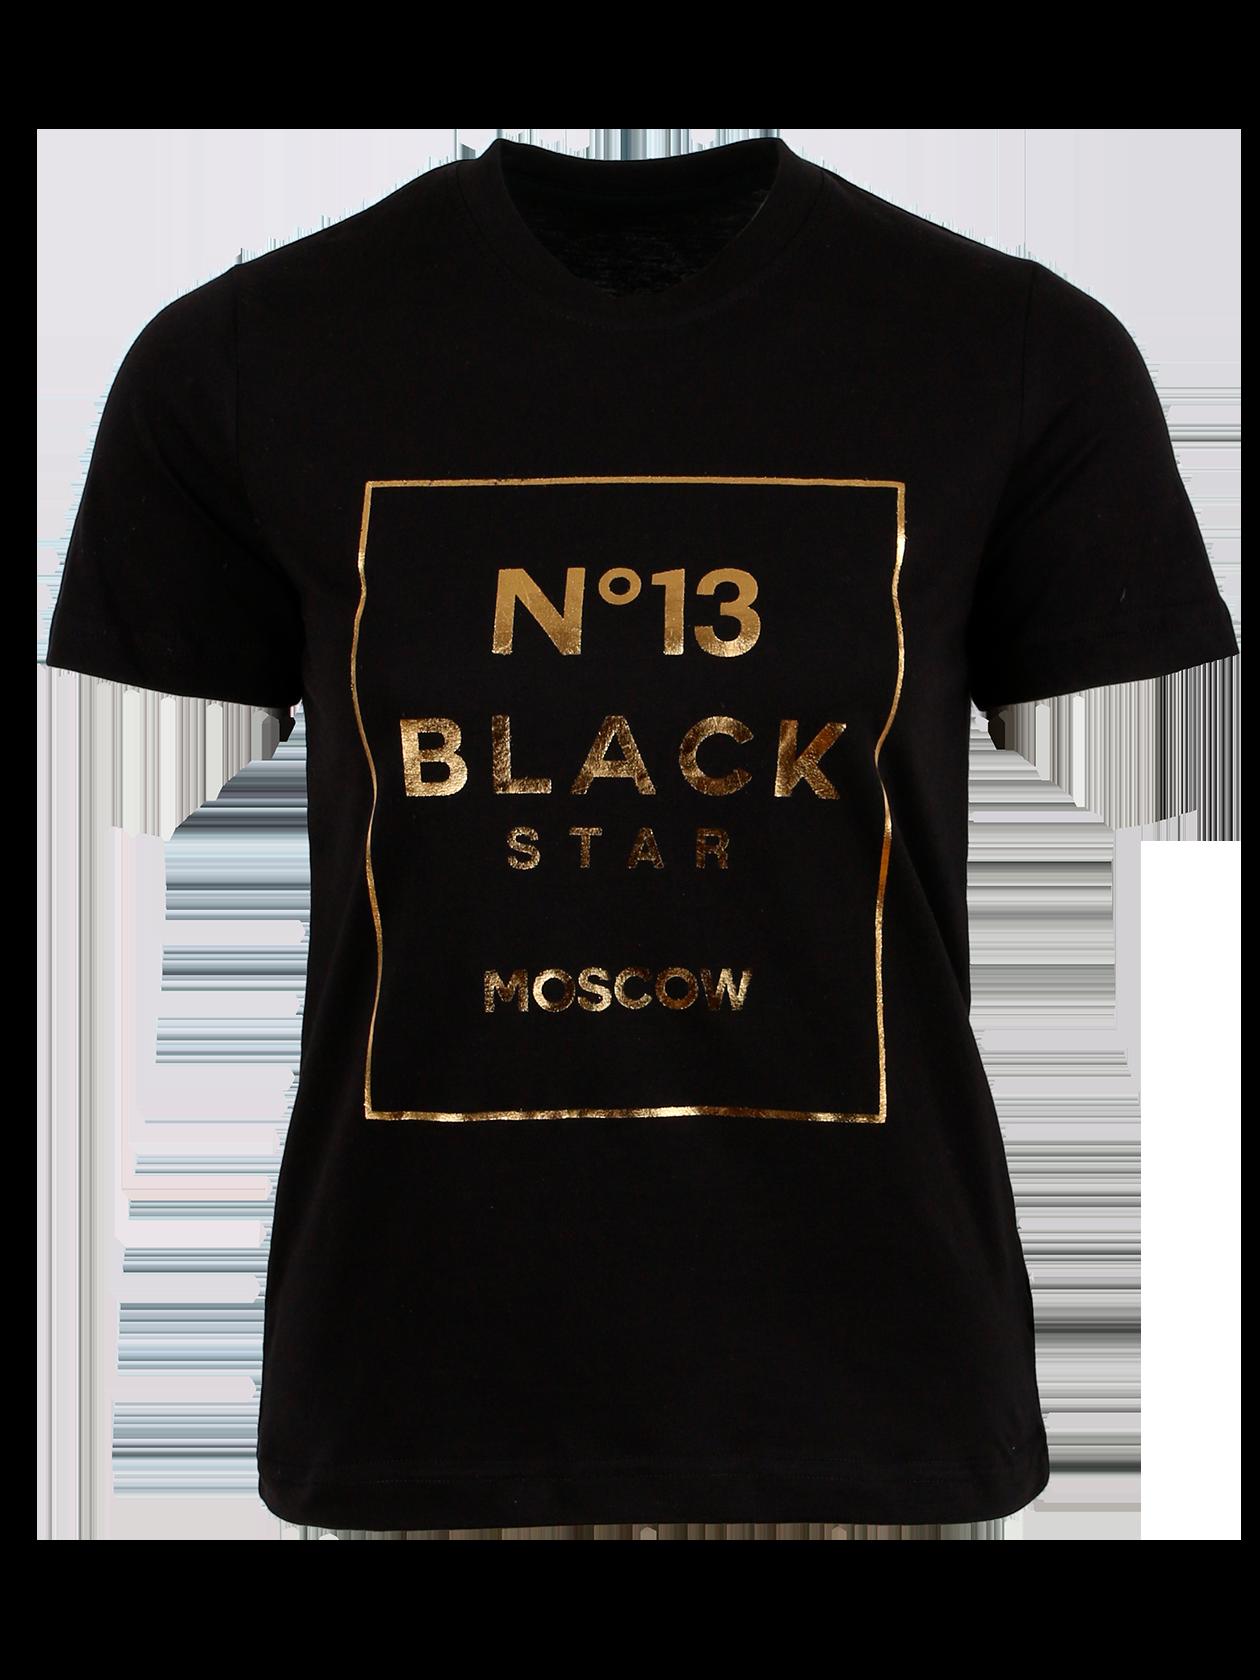 Футболка подростковая №13 от Black Star